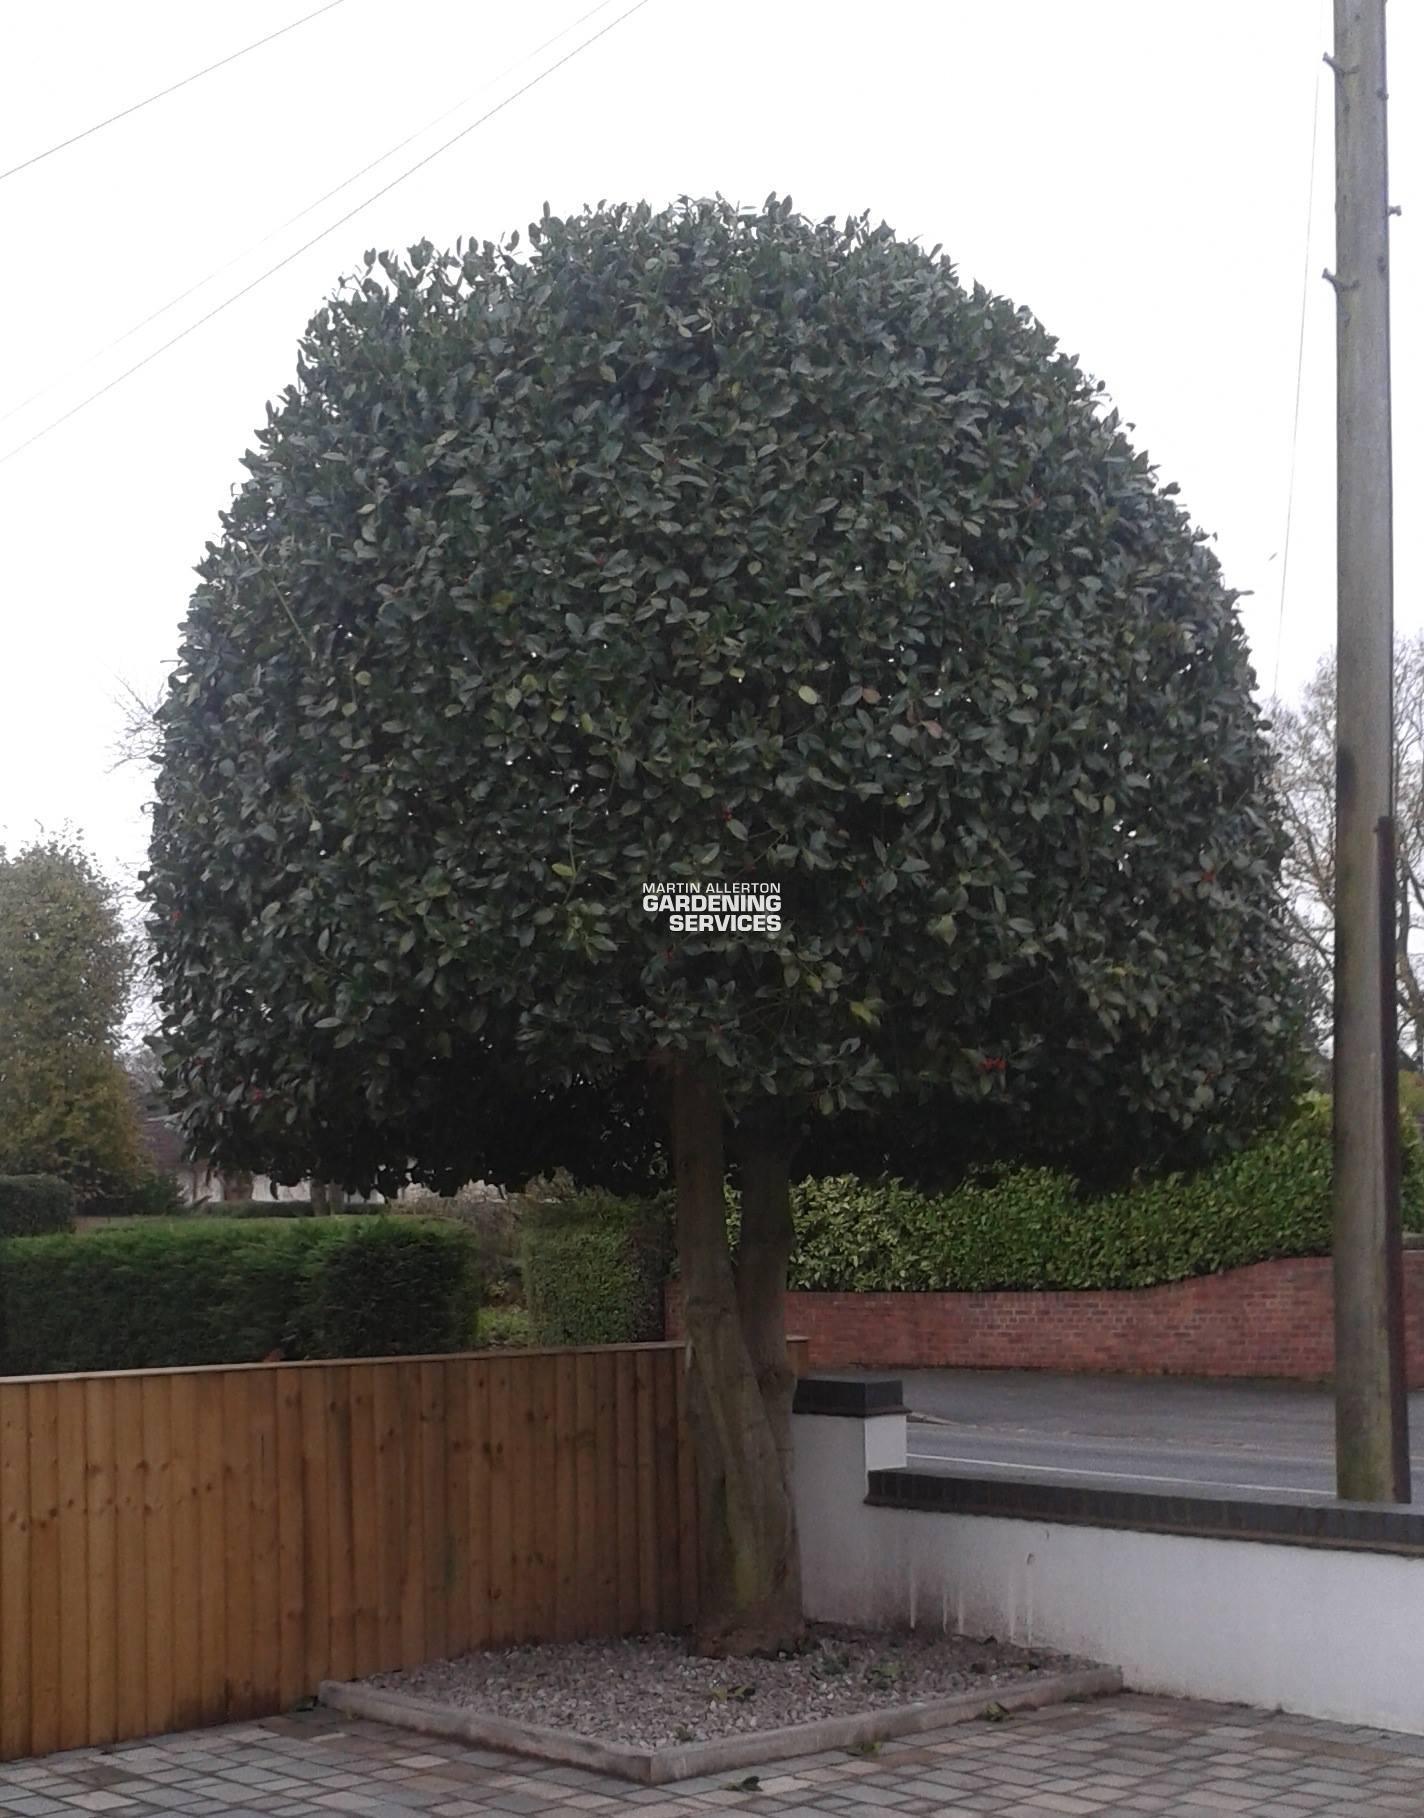 Barlaston tree shaping - after